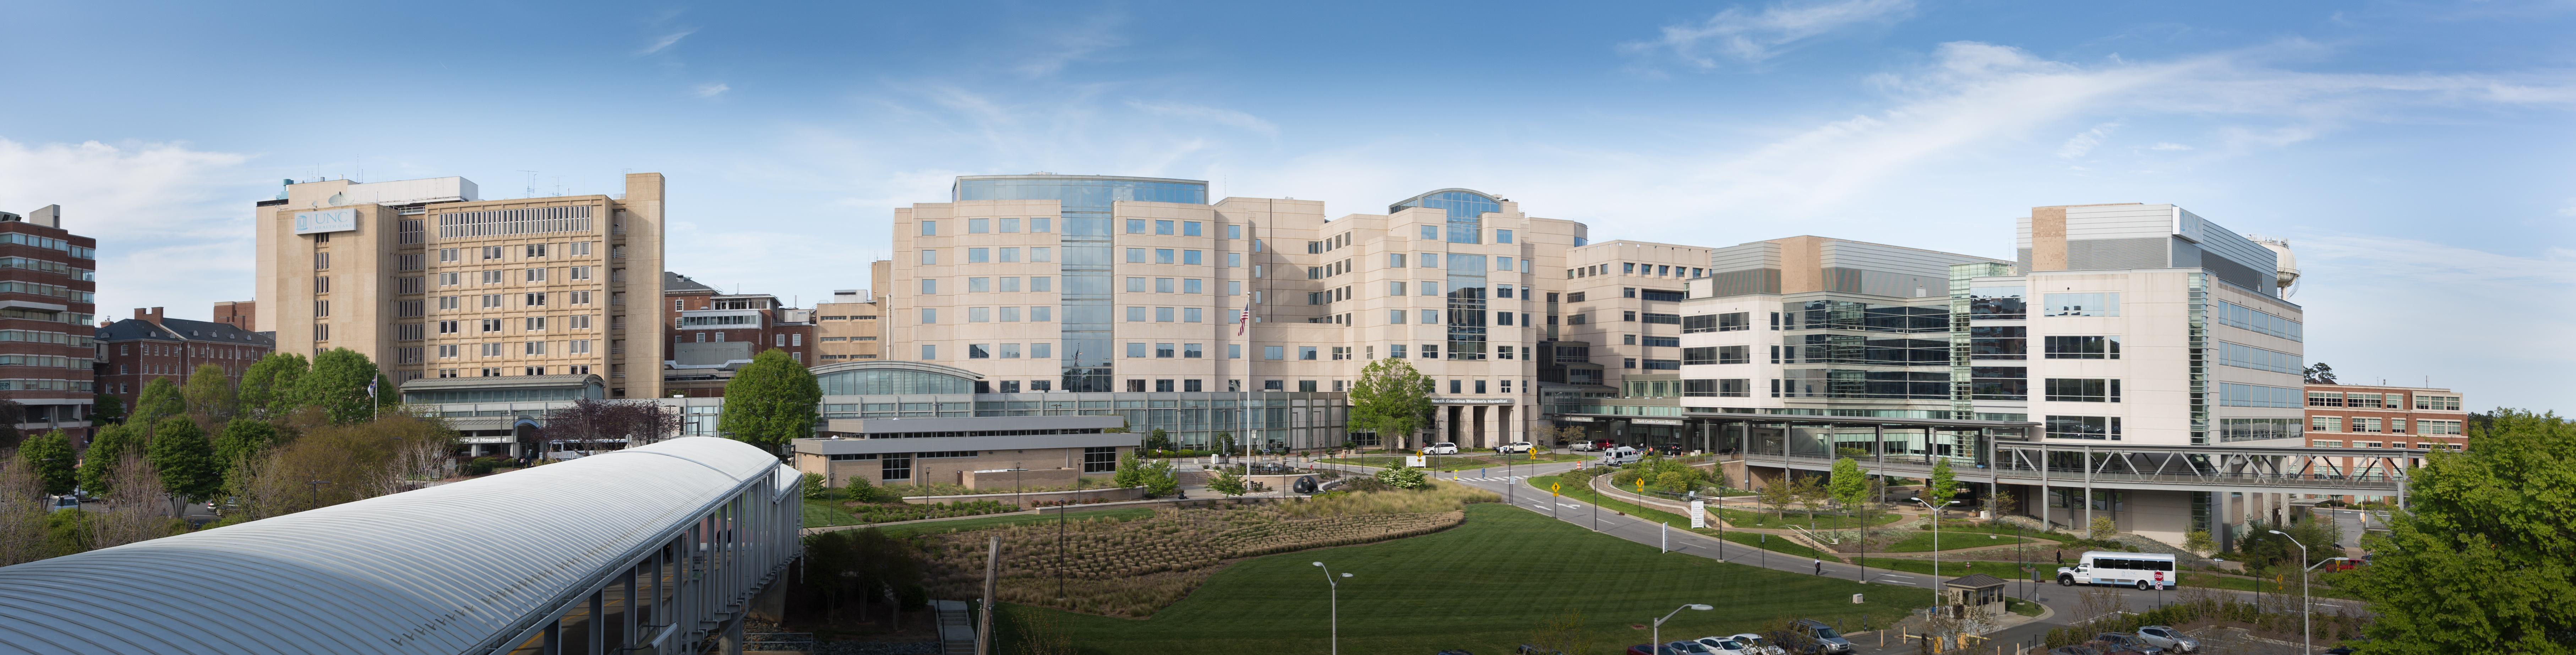 UNC Center for Health Innovation